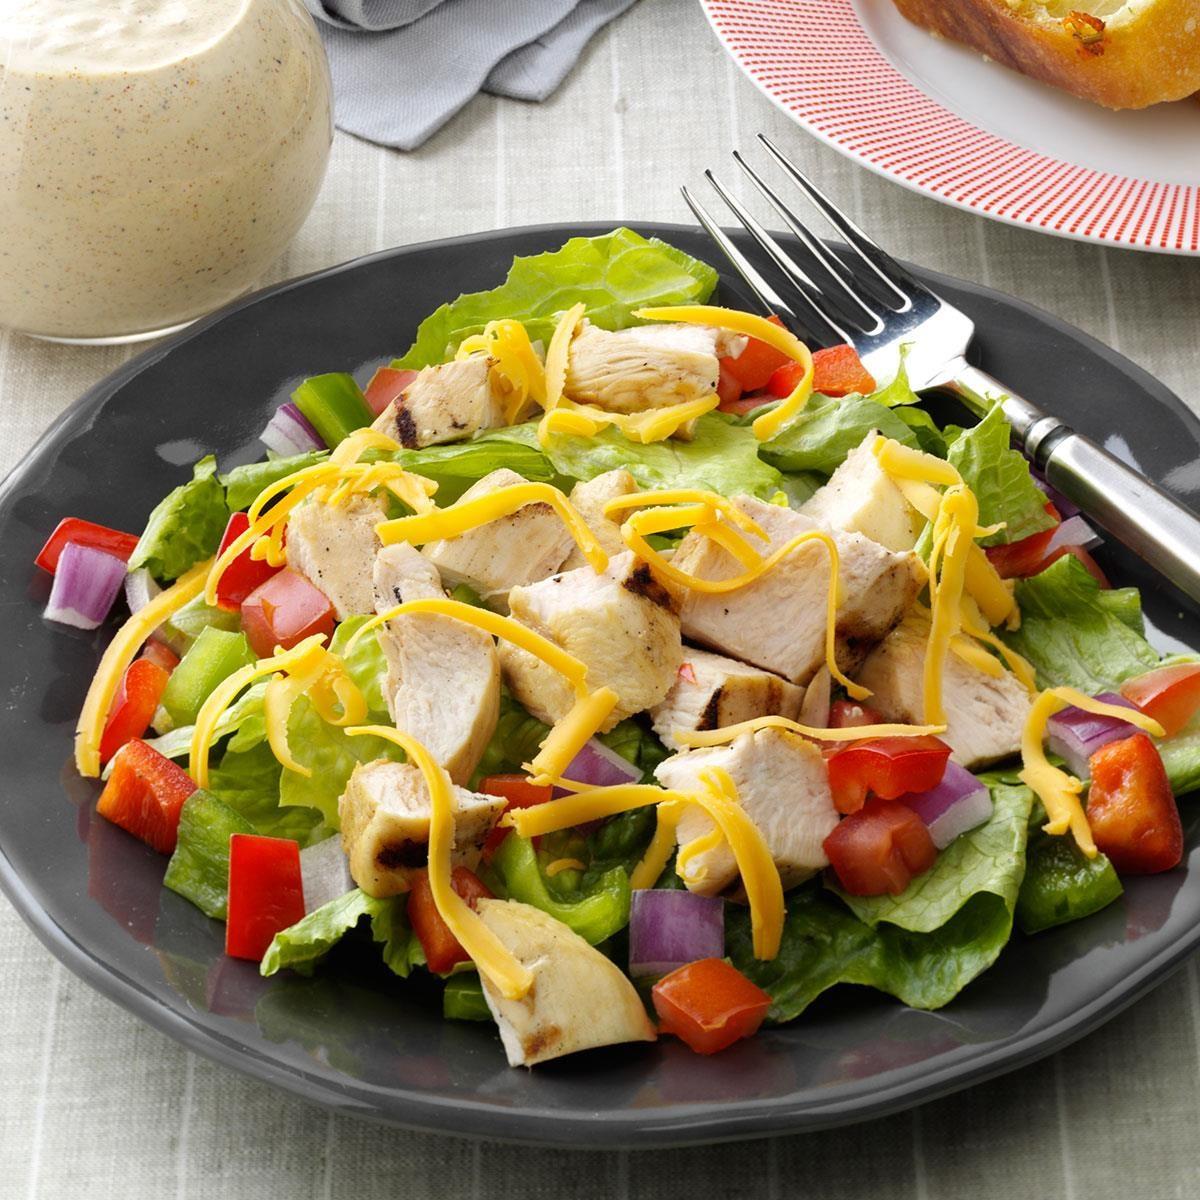 Inspired by: Culver's Garden Fresco with Grilled Chicken Salad